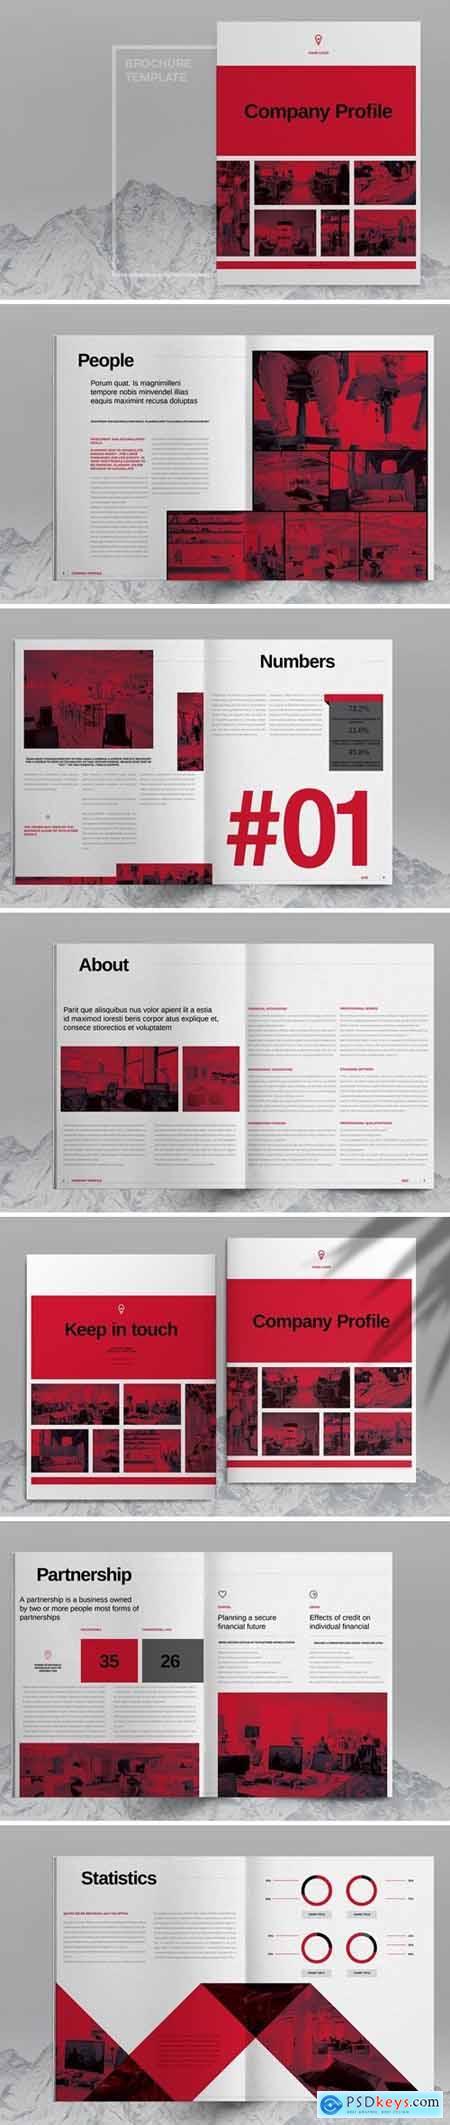 Red Grid Brochure Template